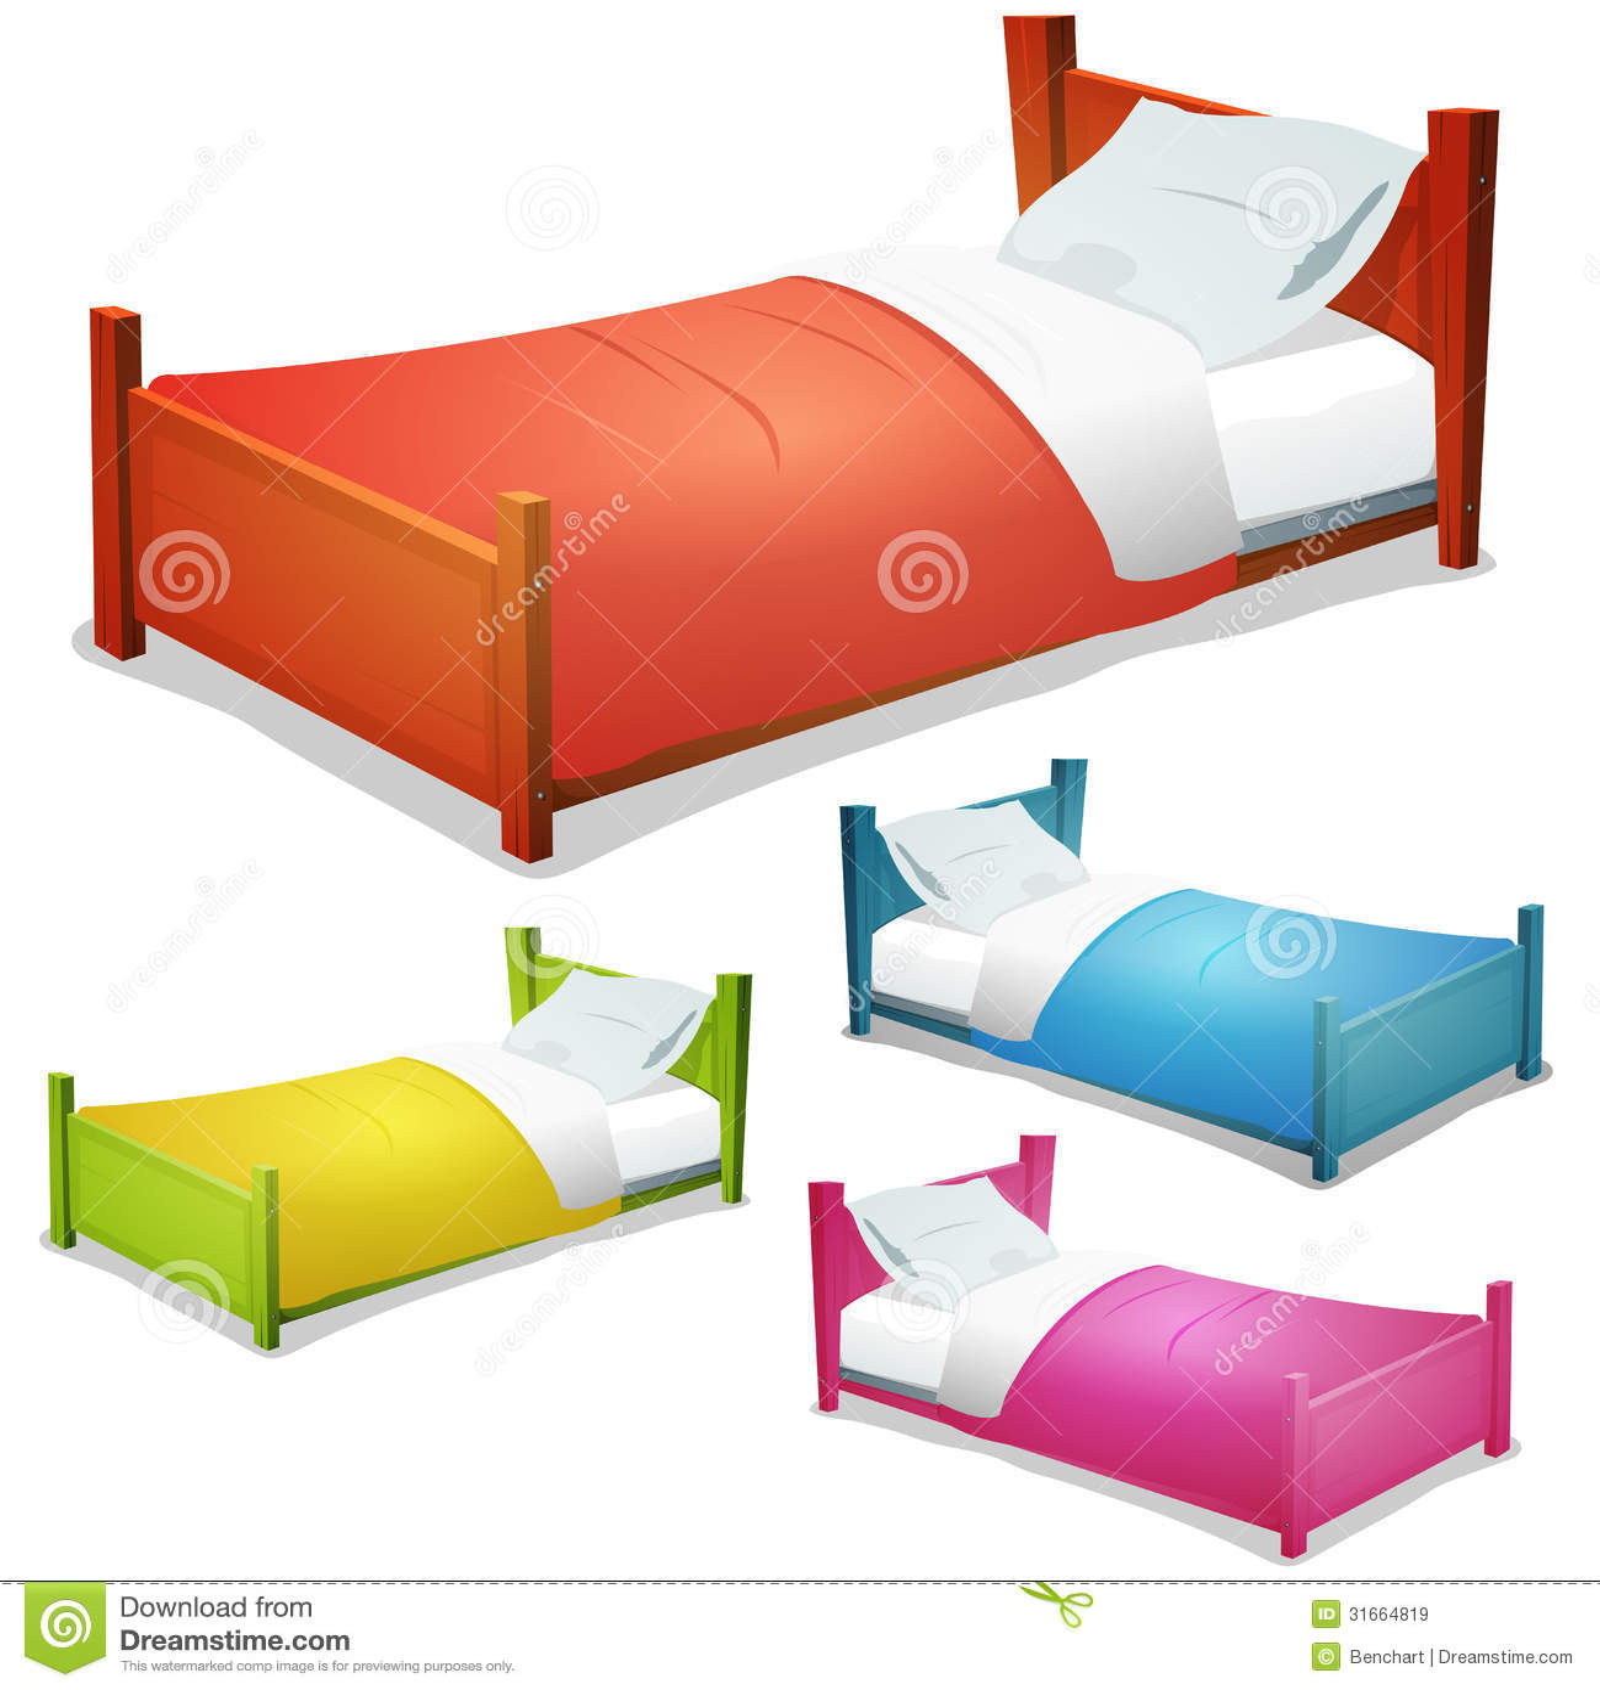 Cartoon bed set stock vector illustration of sheet for Bed models images